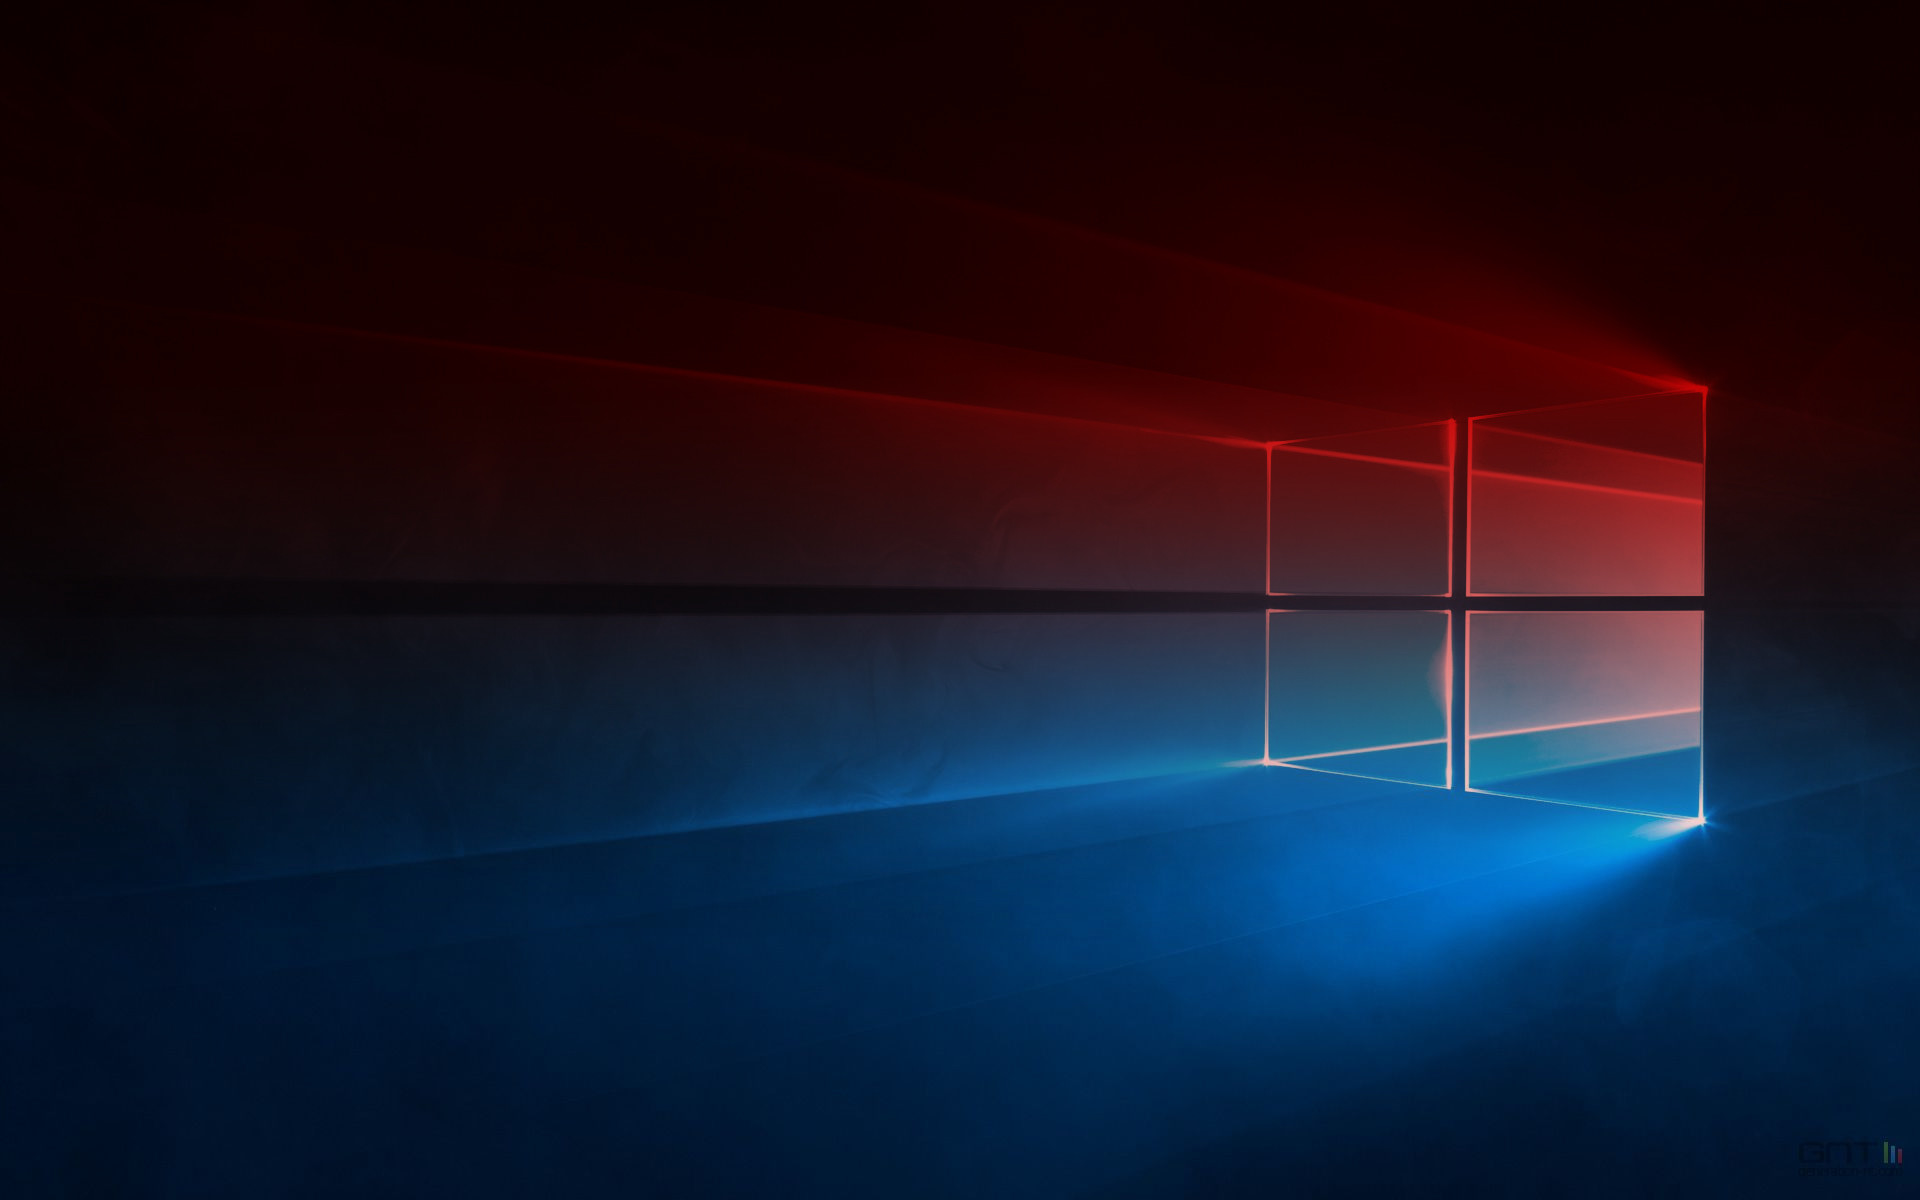 Windows 10 Wallpapers: Windows 10 Futuristic Wallpaper (70+ Images